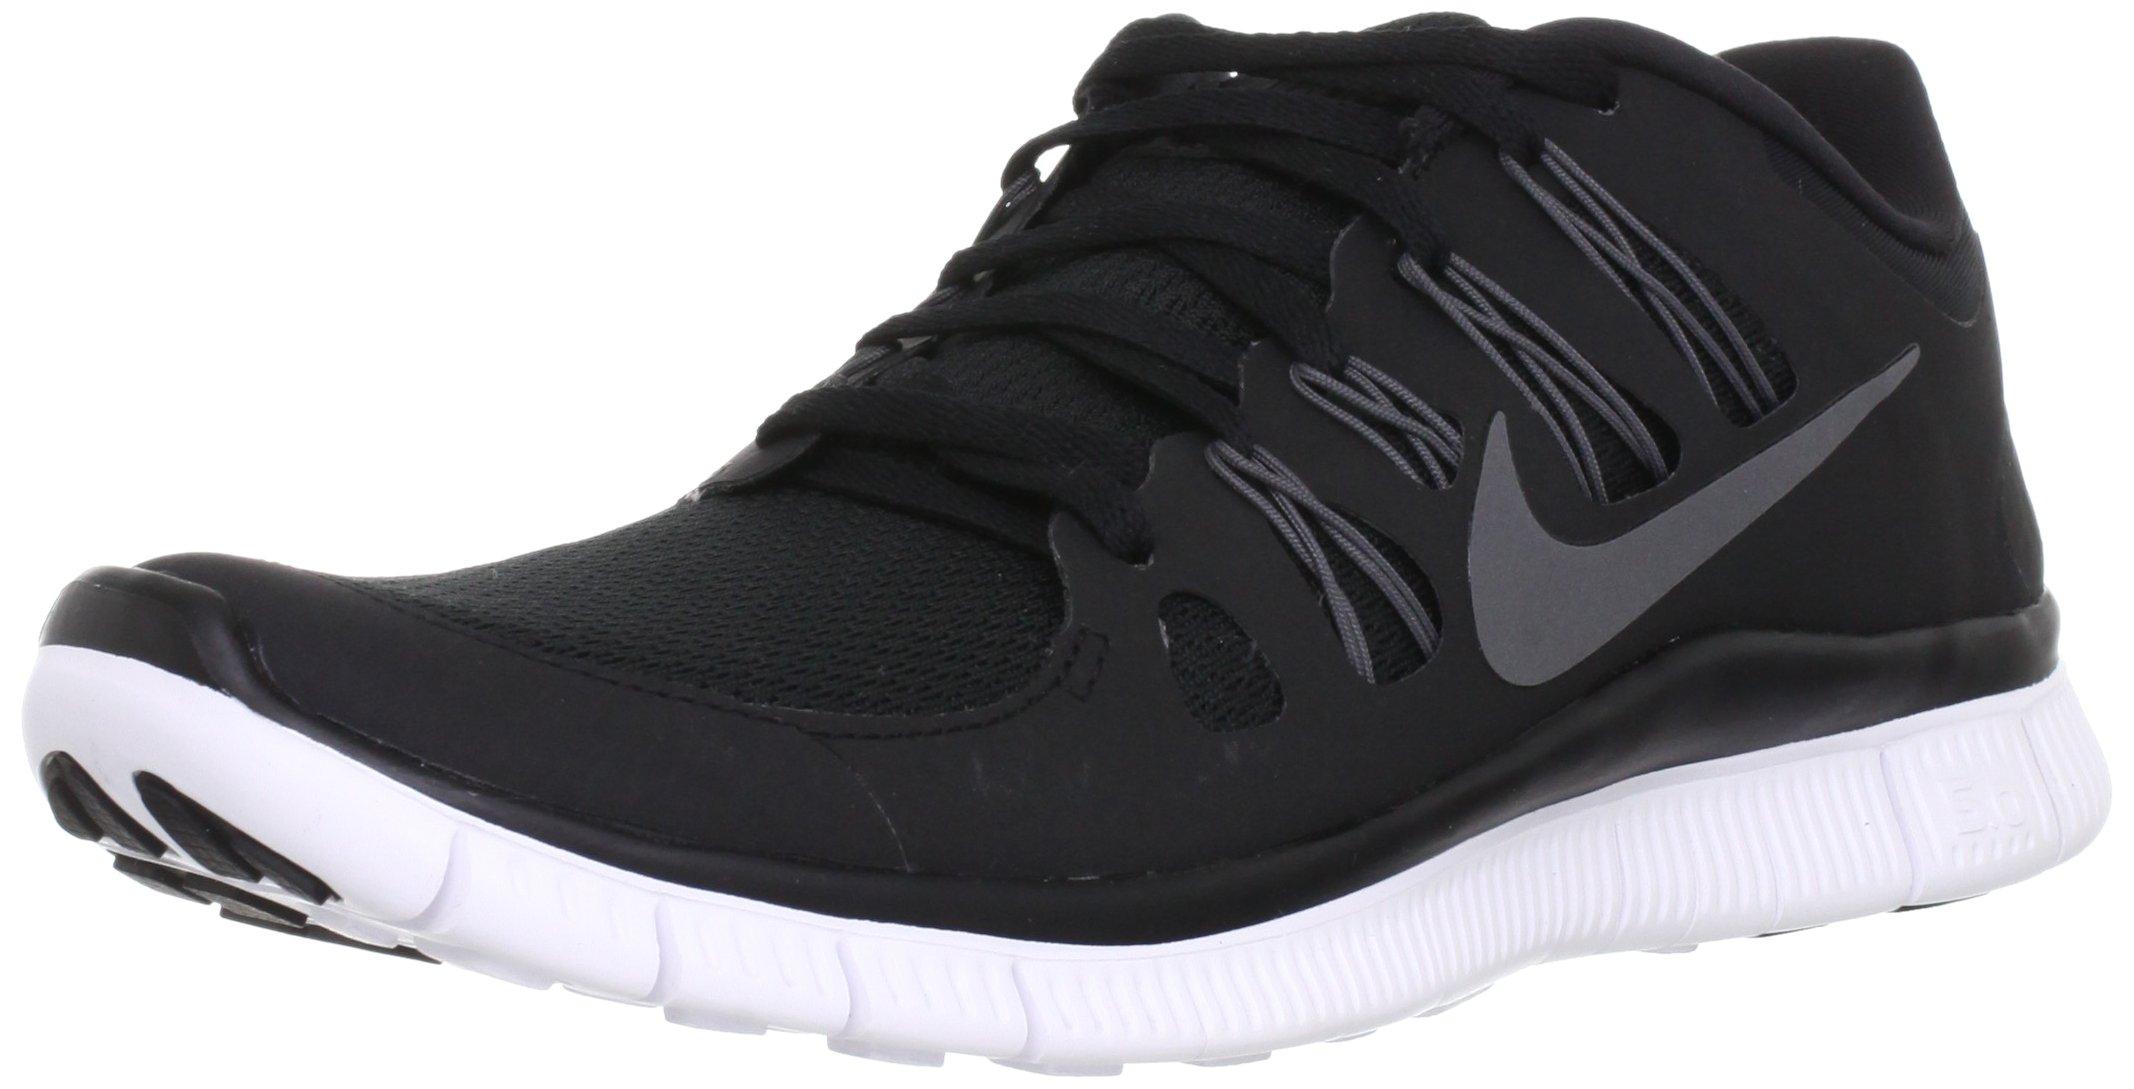 Nike Men's Free 5.0+ Breathe Running Black